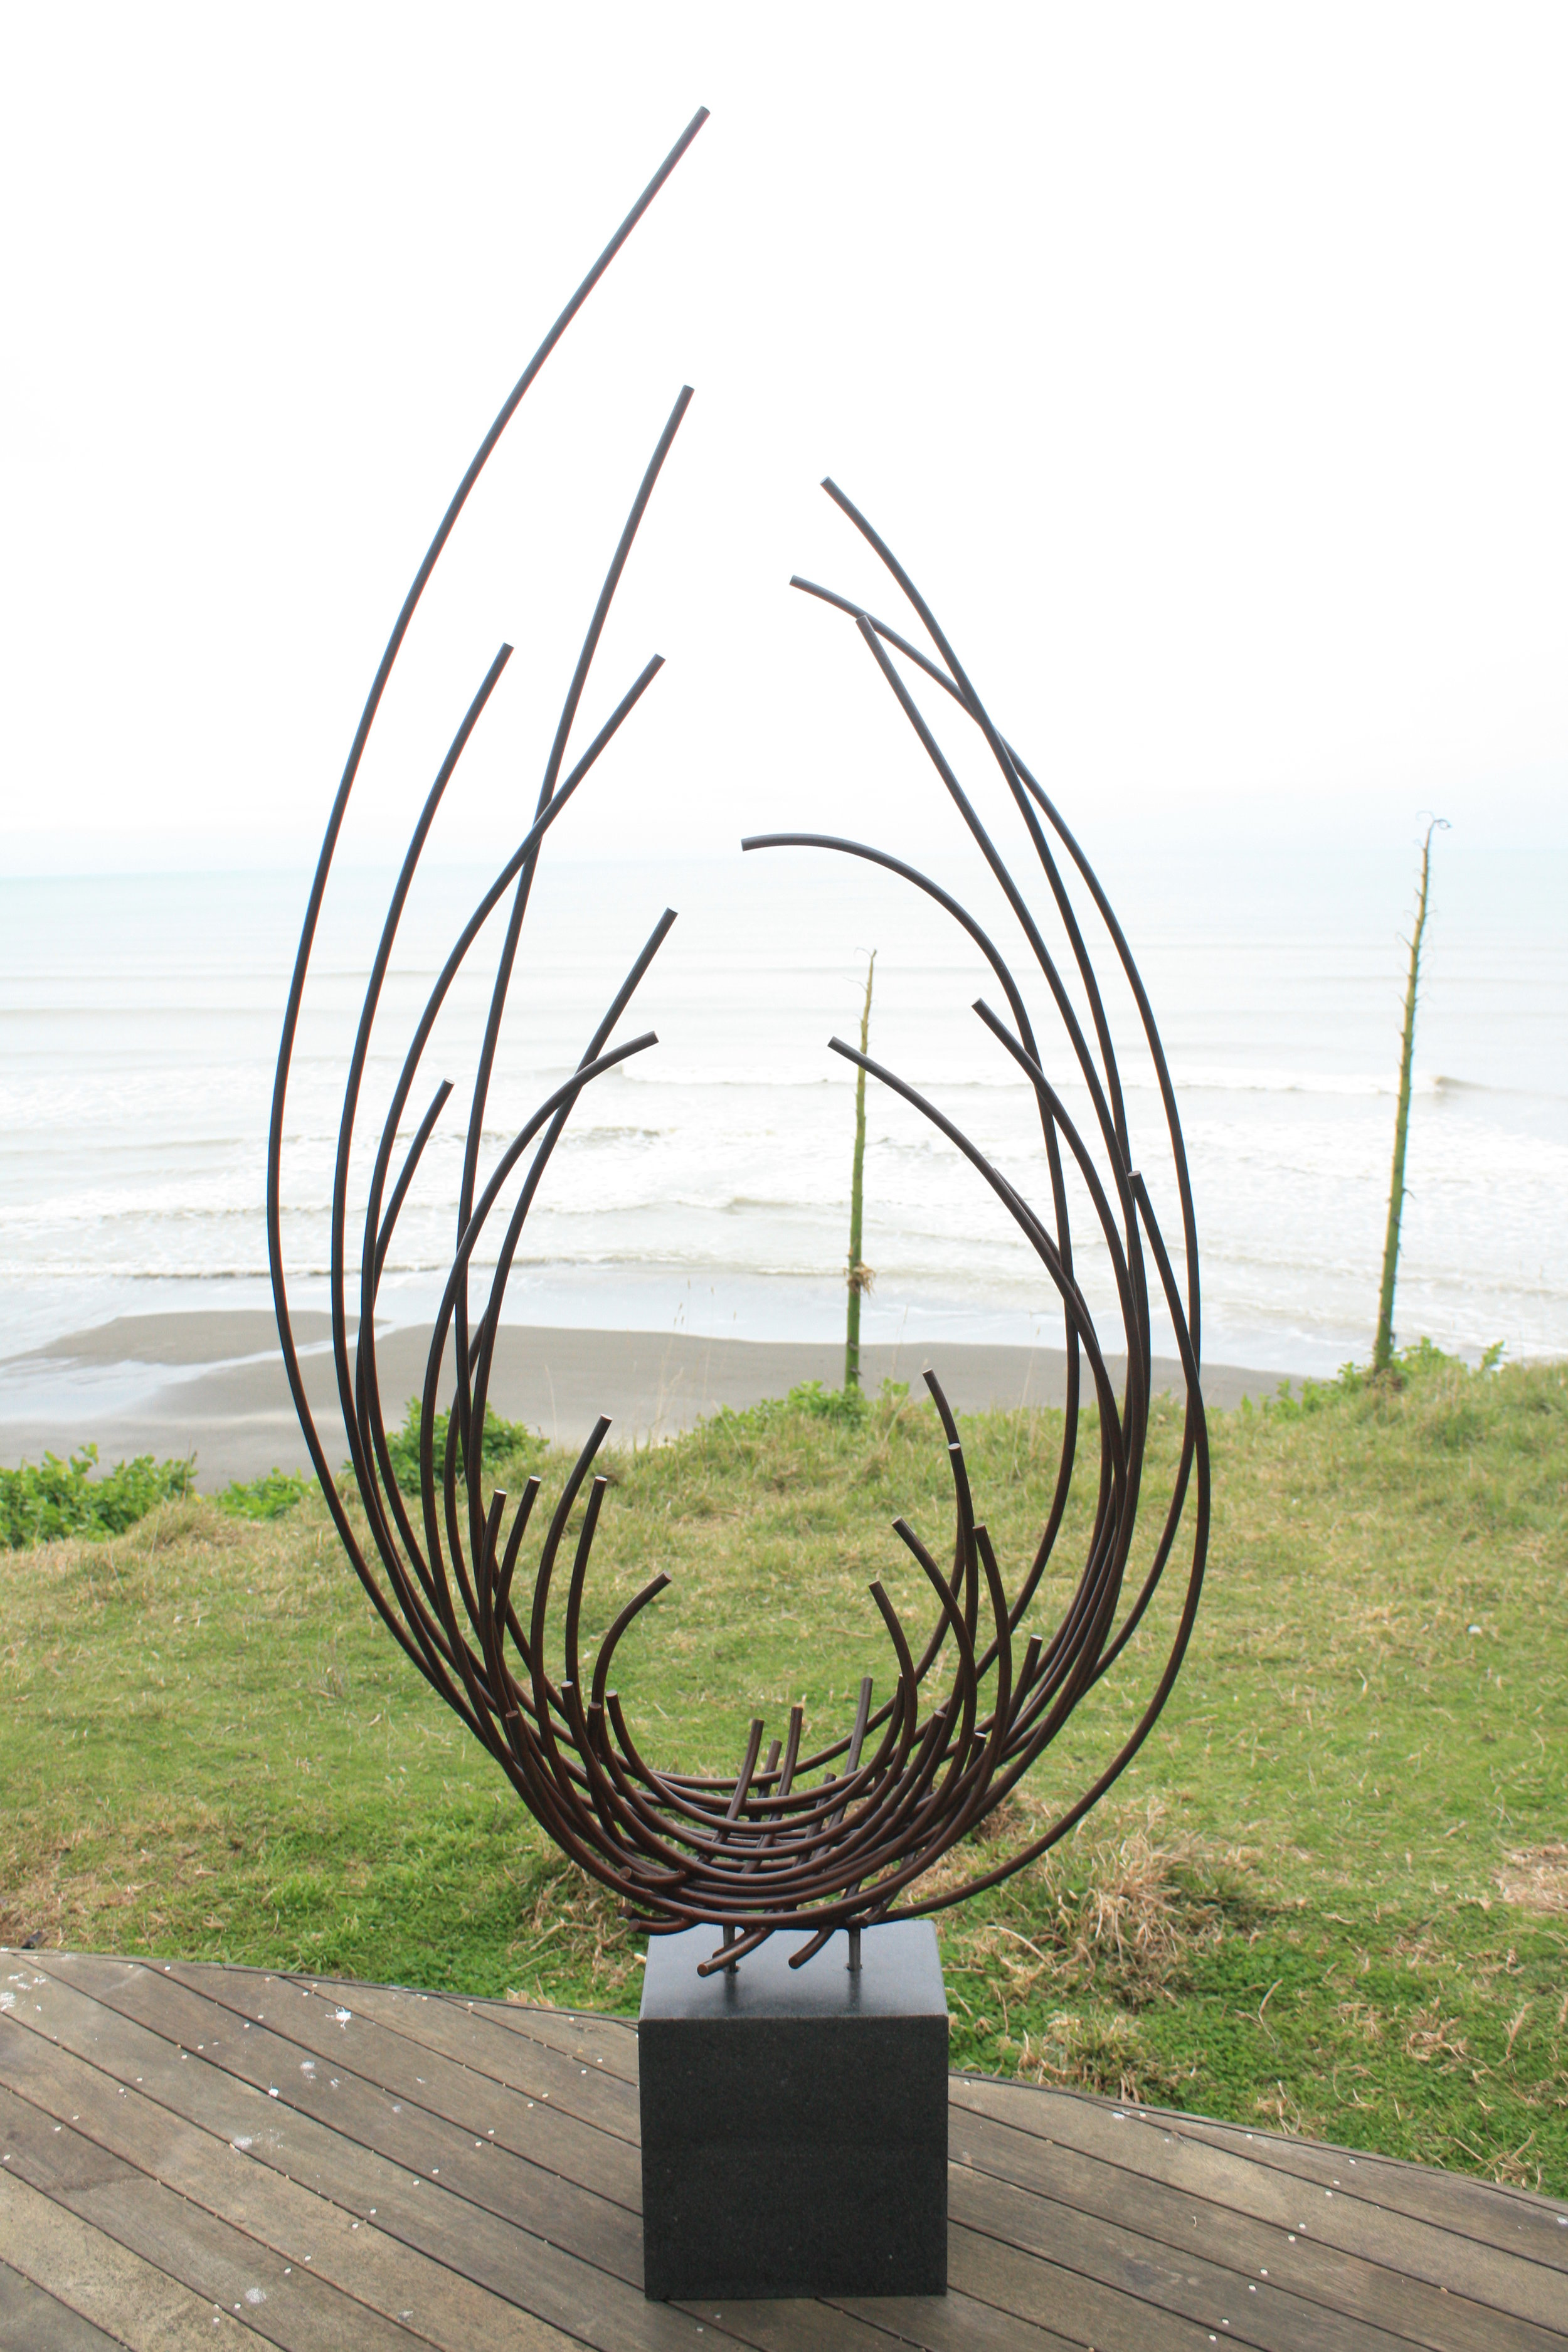 Blossom - 2015Steel, Basalt220h x 95 x 44 cmSOLD